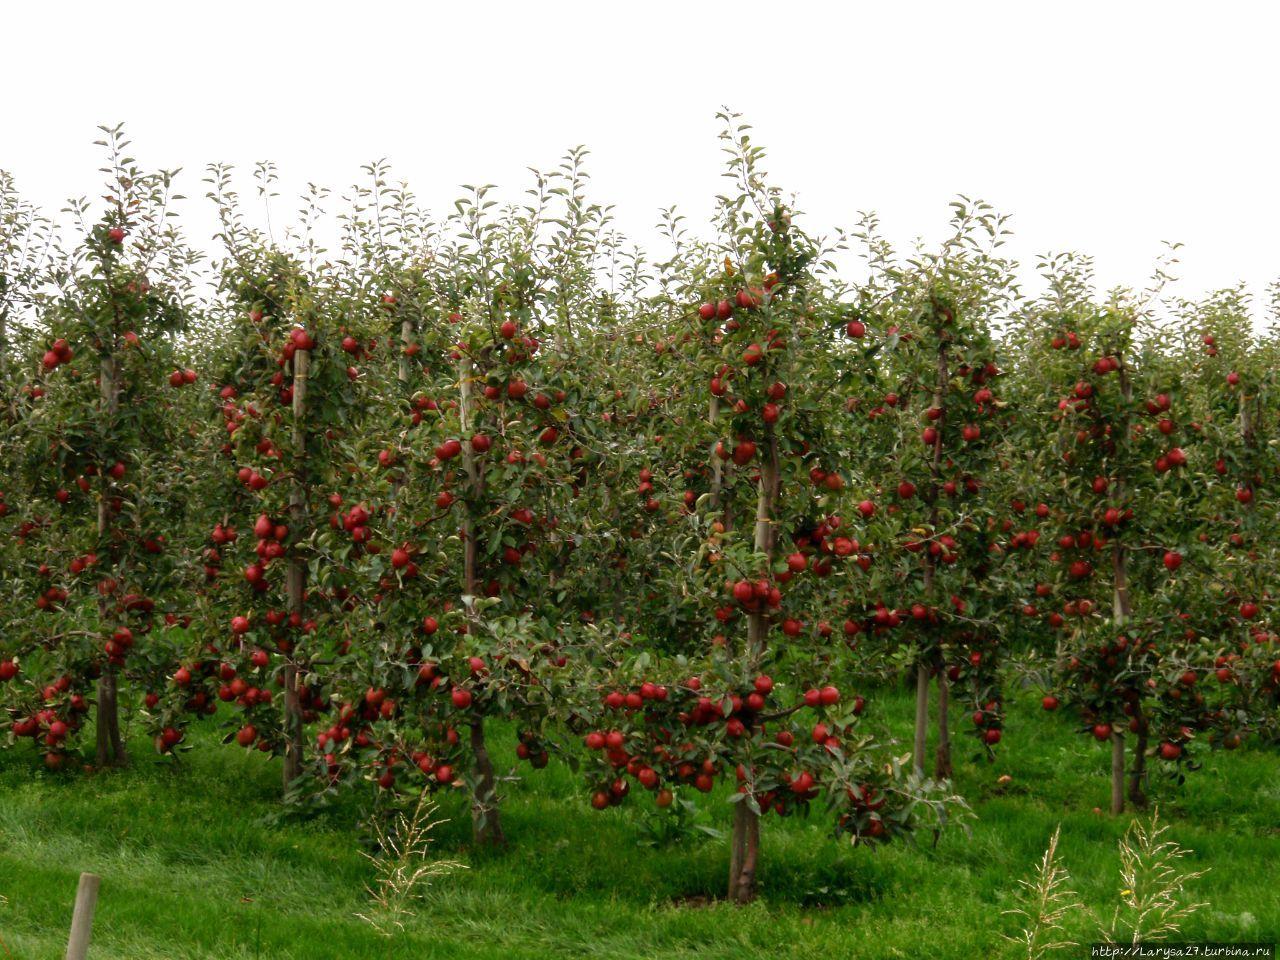 Отяжелевшие яблони всё ро